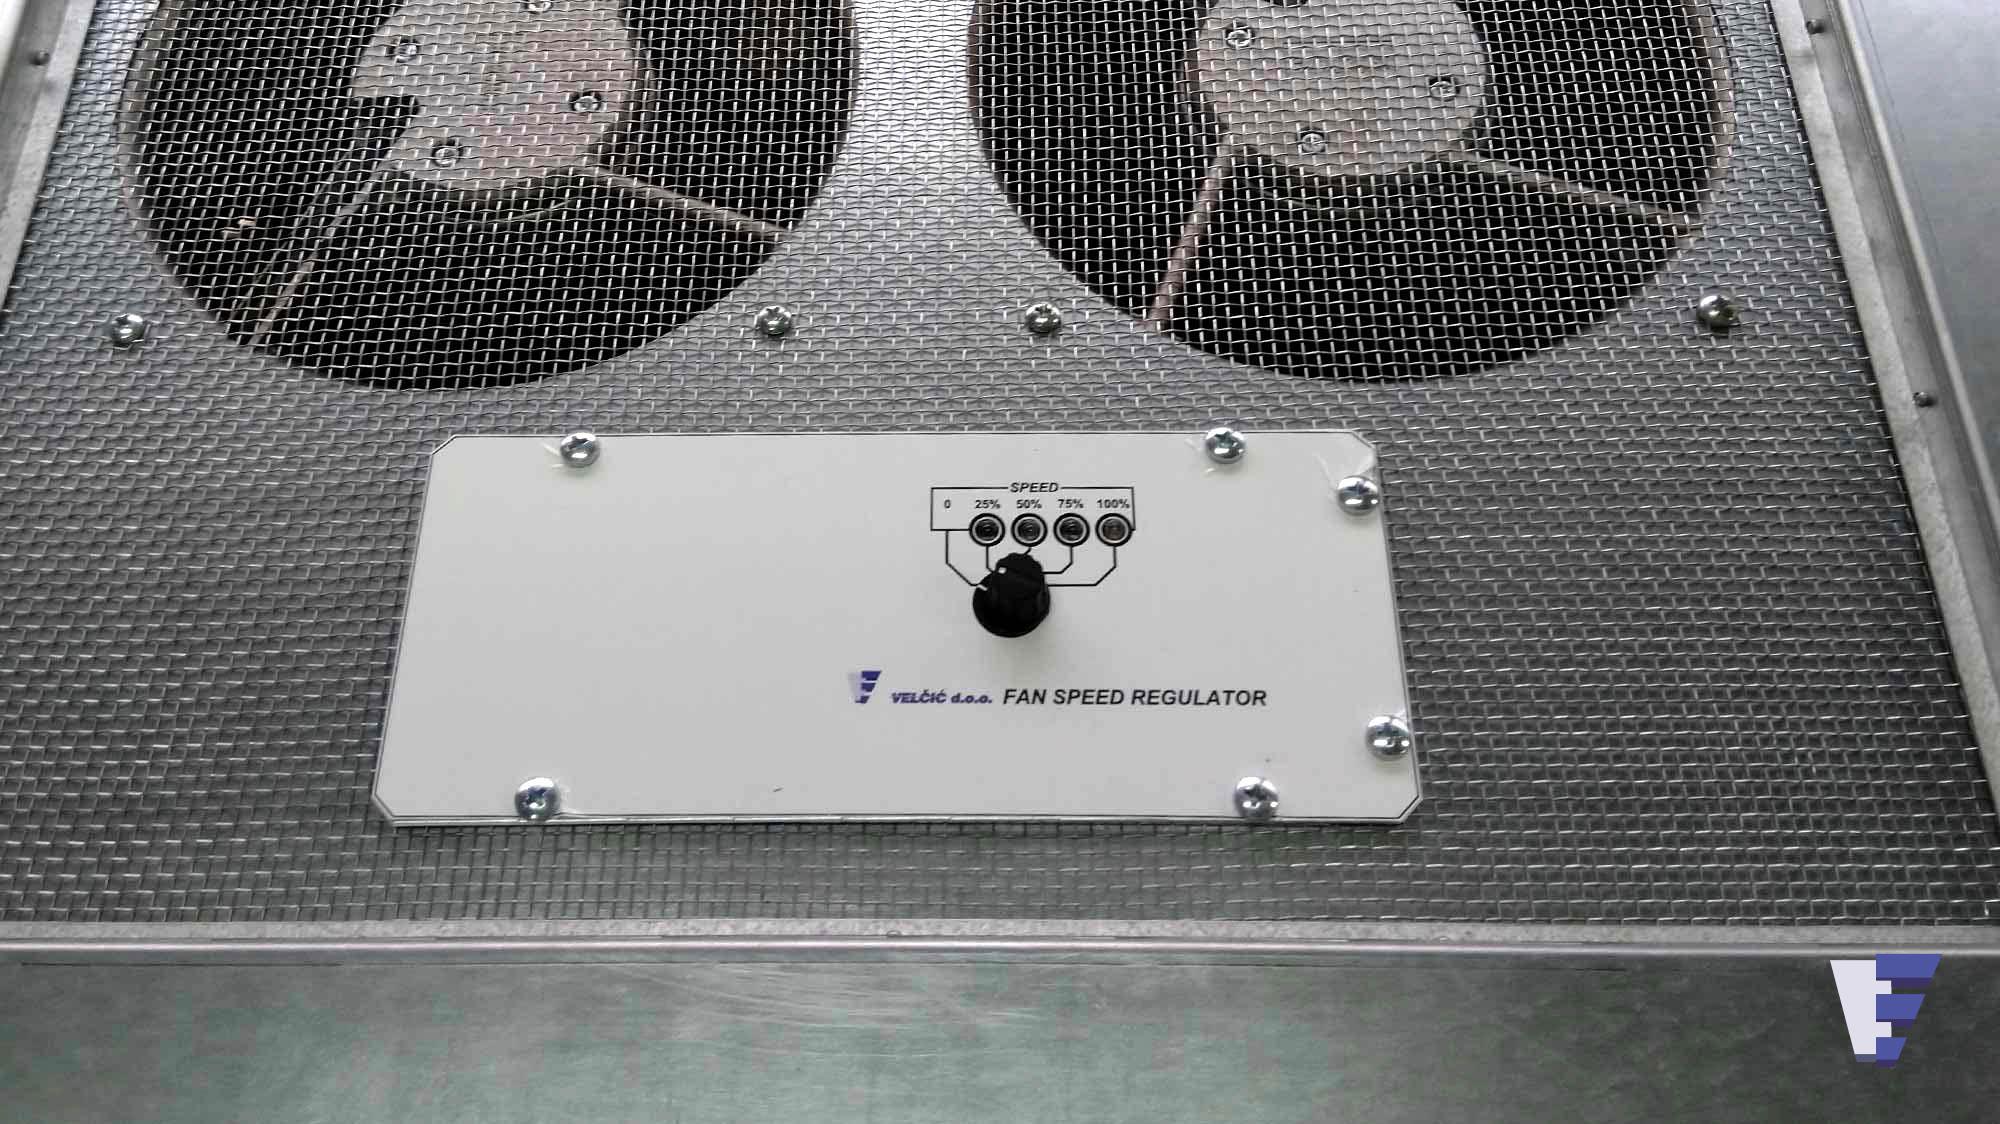 Velčić d.o.o. - Podna ventilatorska jedinica - hlađenje telek